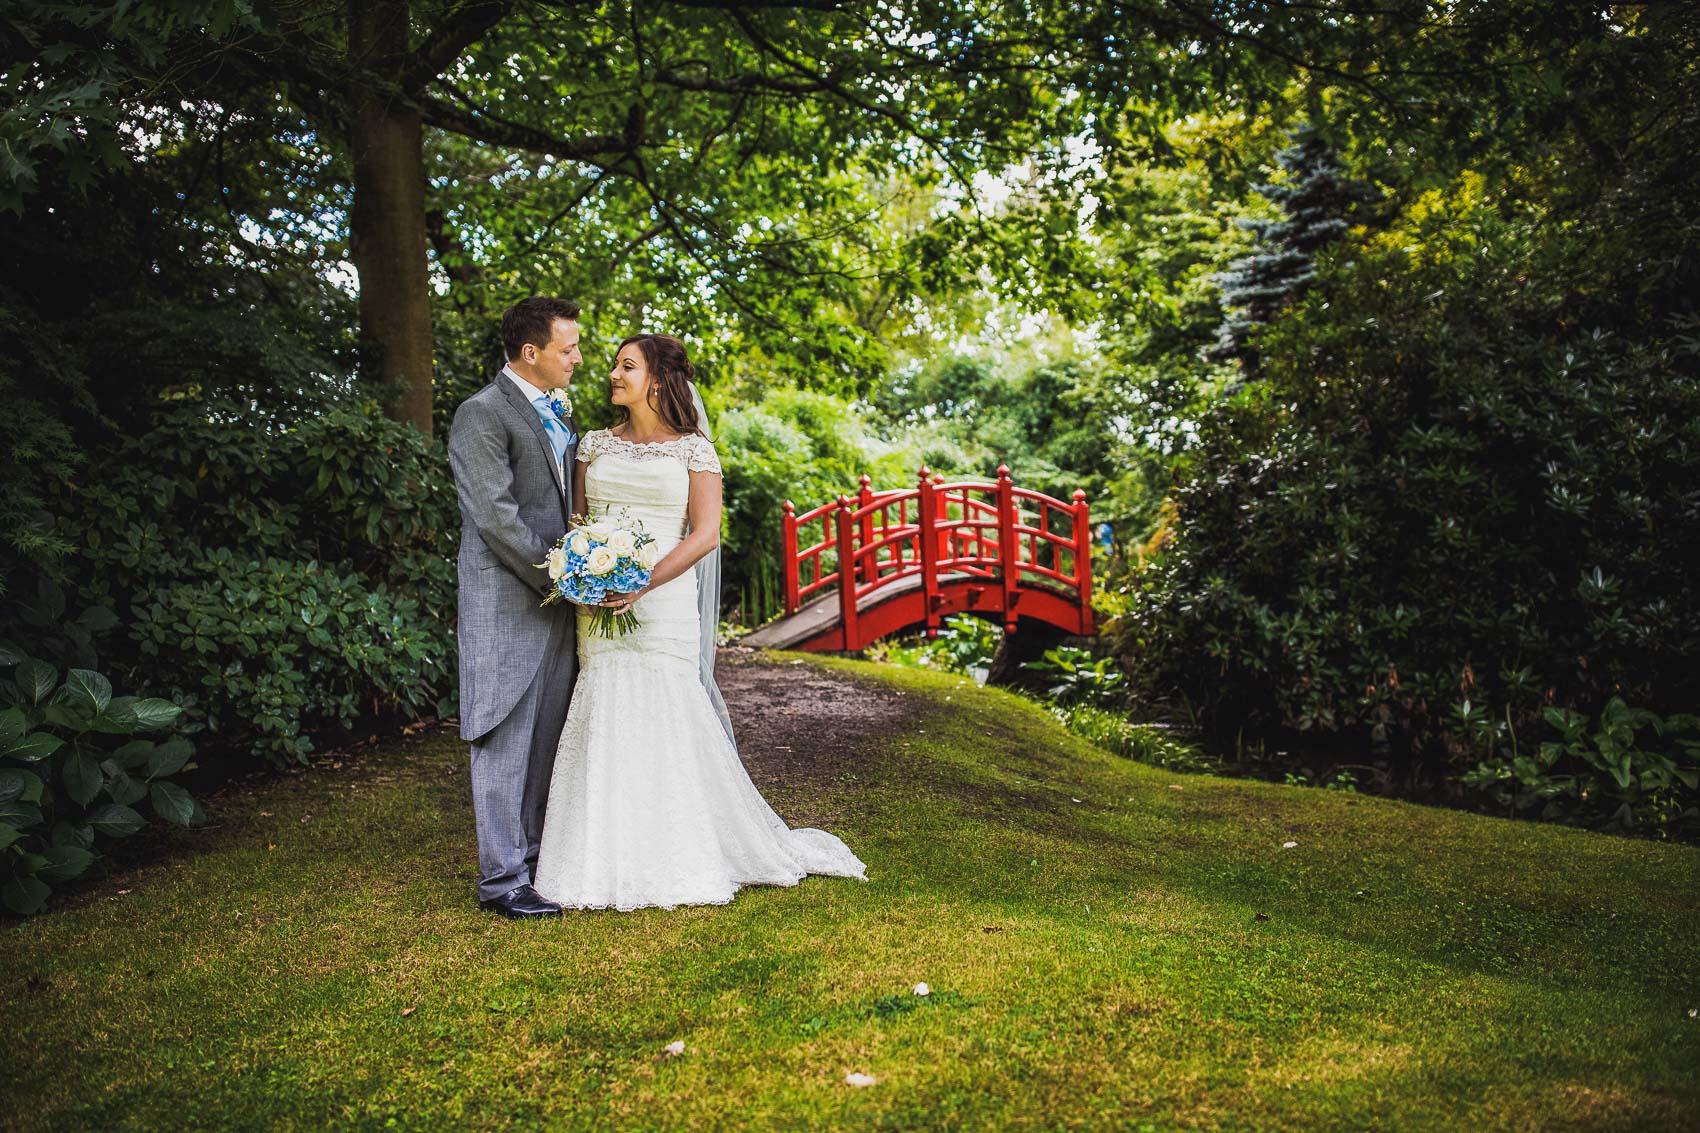 Rivervale Barn Wedding Photographer - Oli and Leyla 34